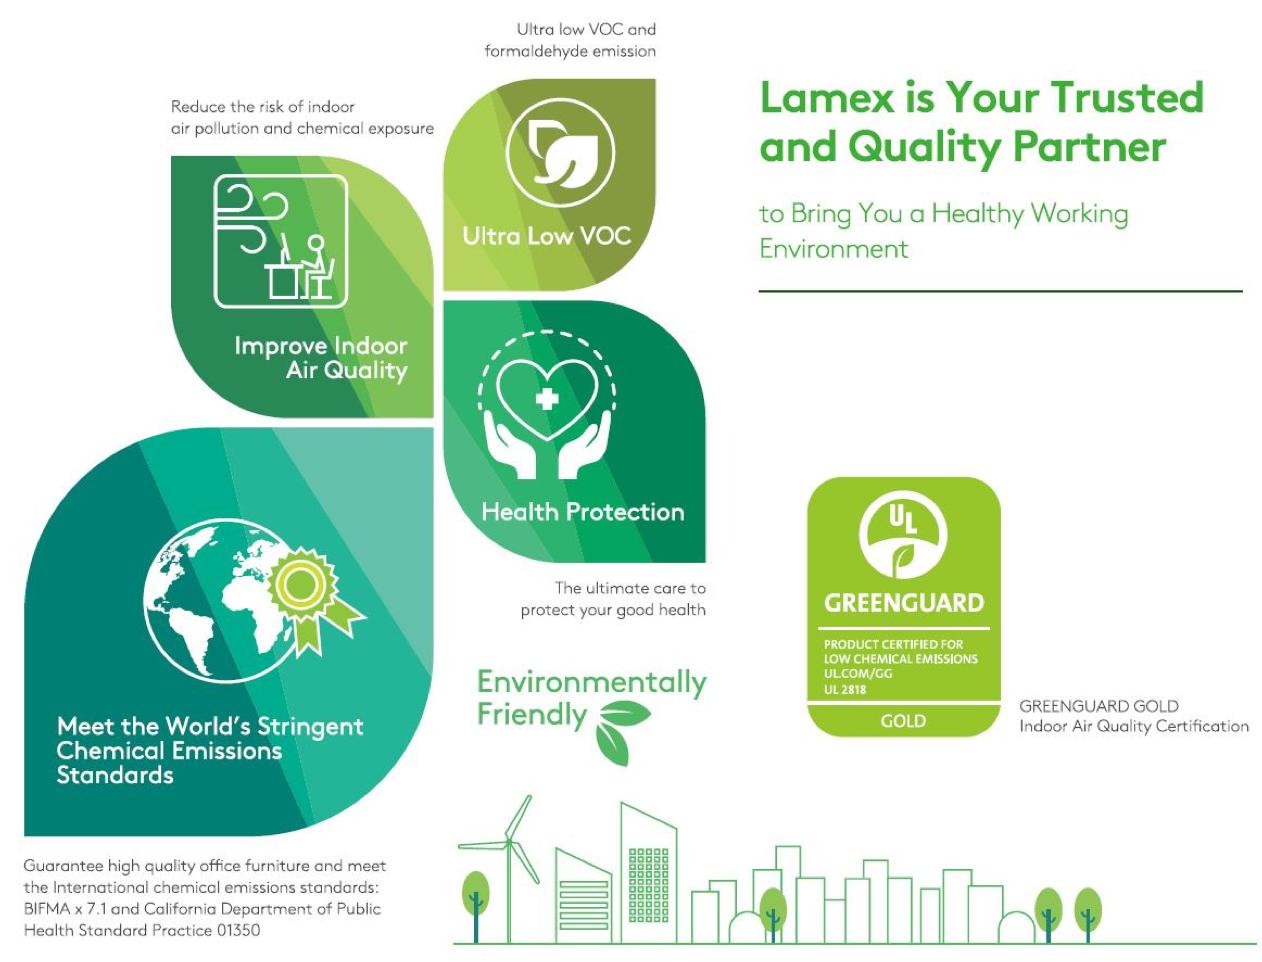 Lamex Sustainability Lamex